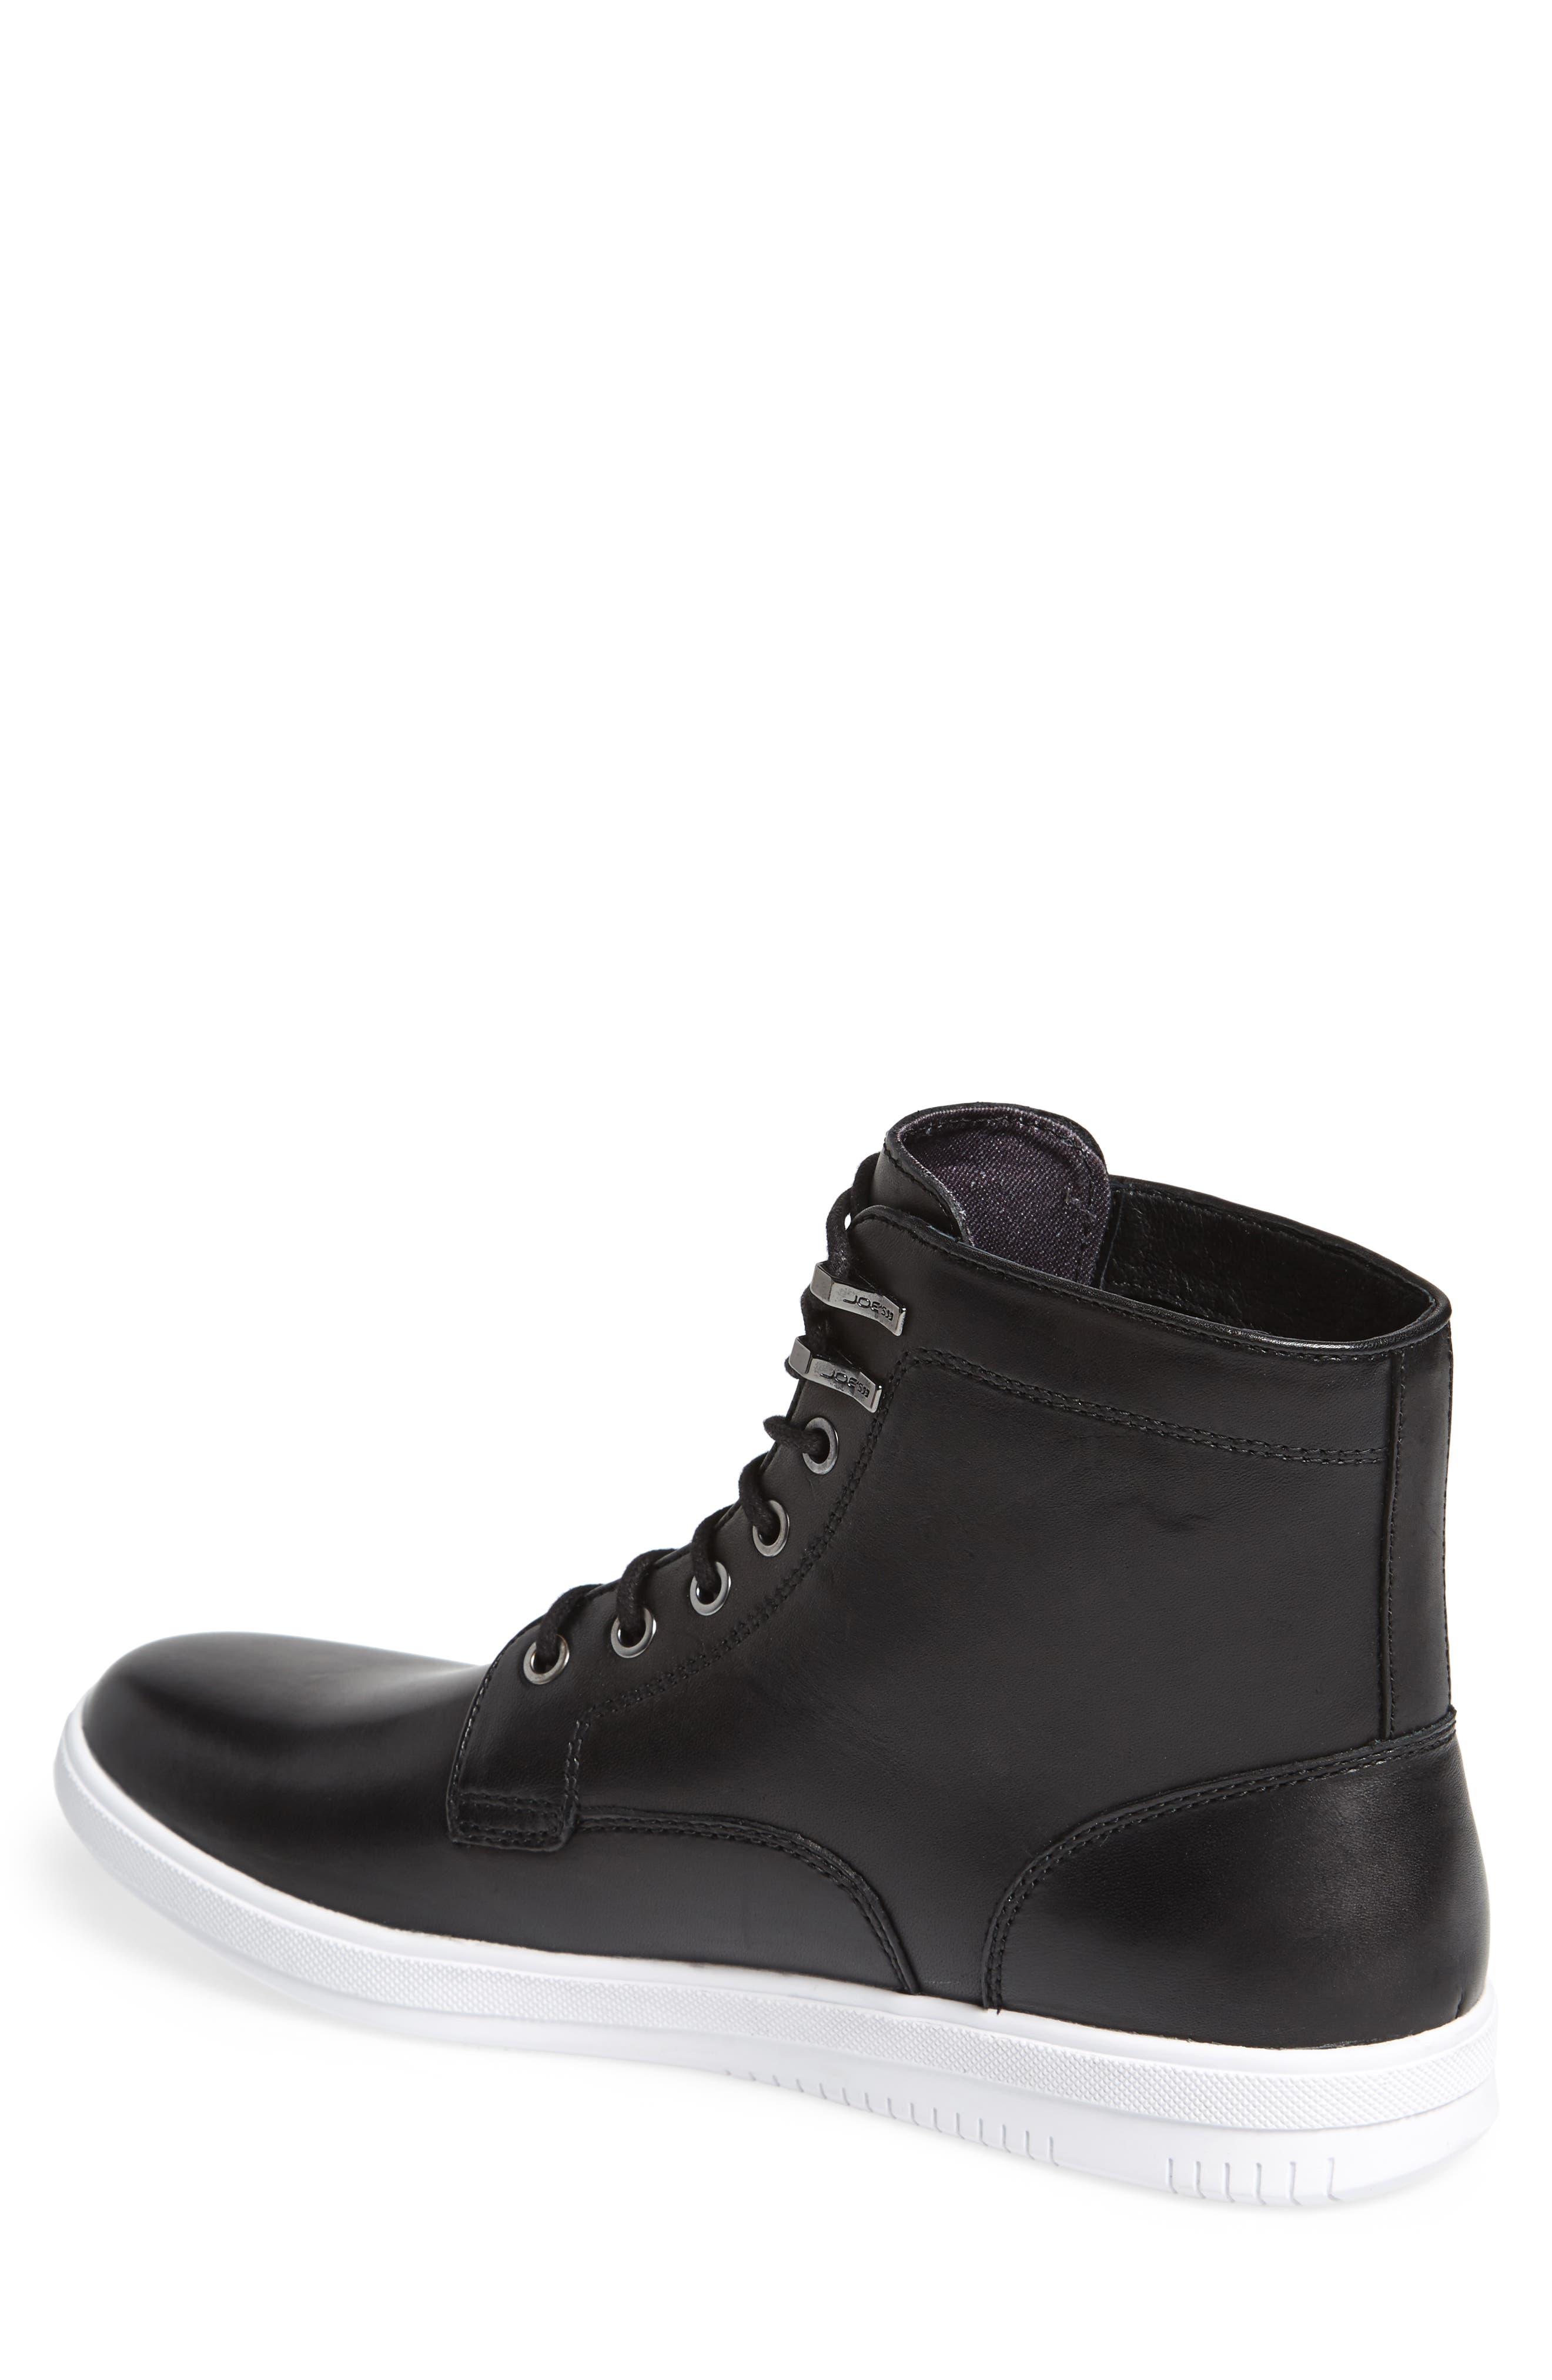 Not So Ordinary Joe Sneaker,                             Alternate thumbnail 2, color,                             001